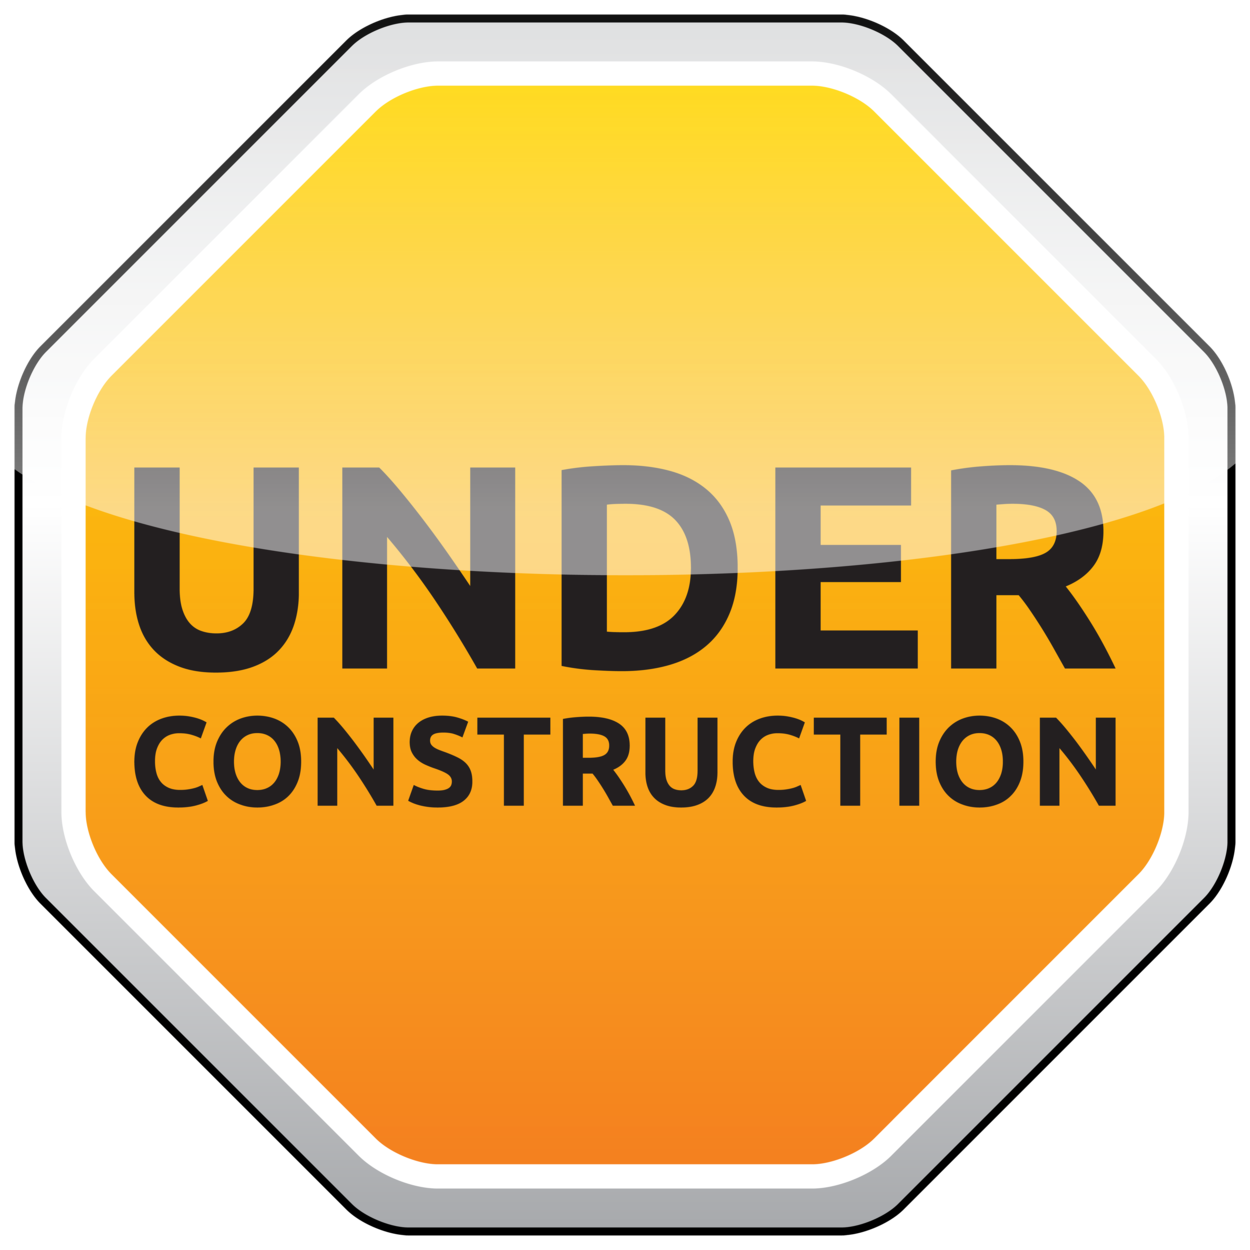 Under construction sign clipart orange picture black and white download Under Construction Sign PNG Clipart picture black and white download